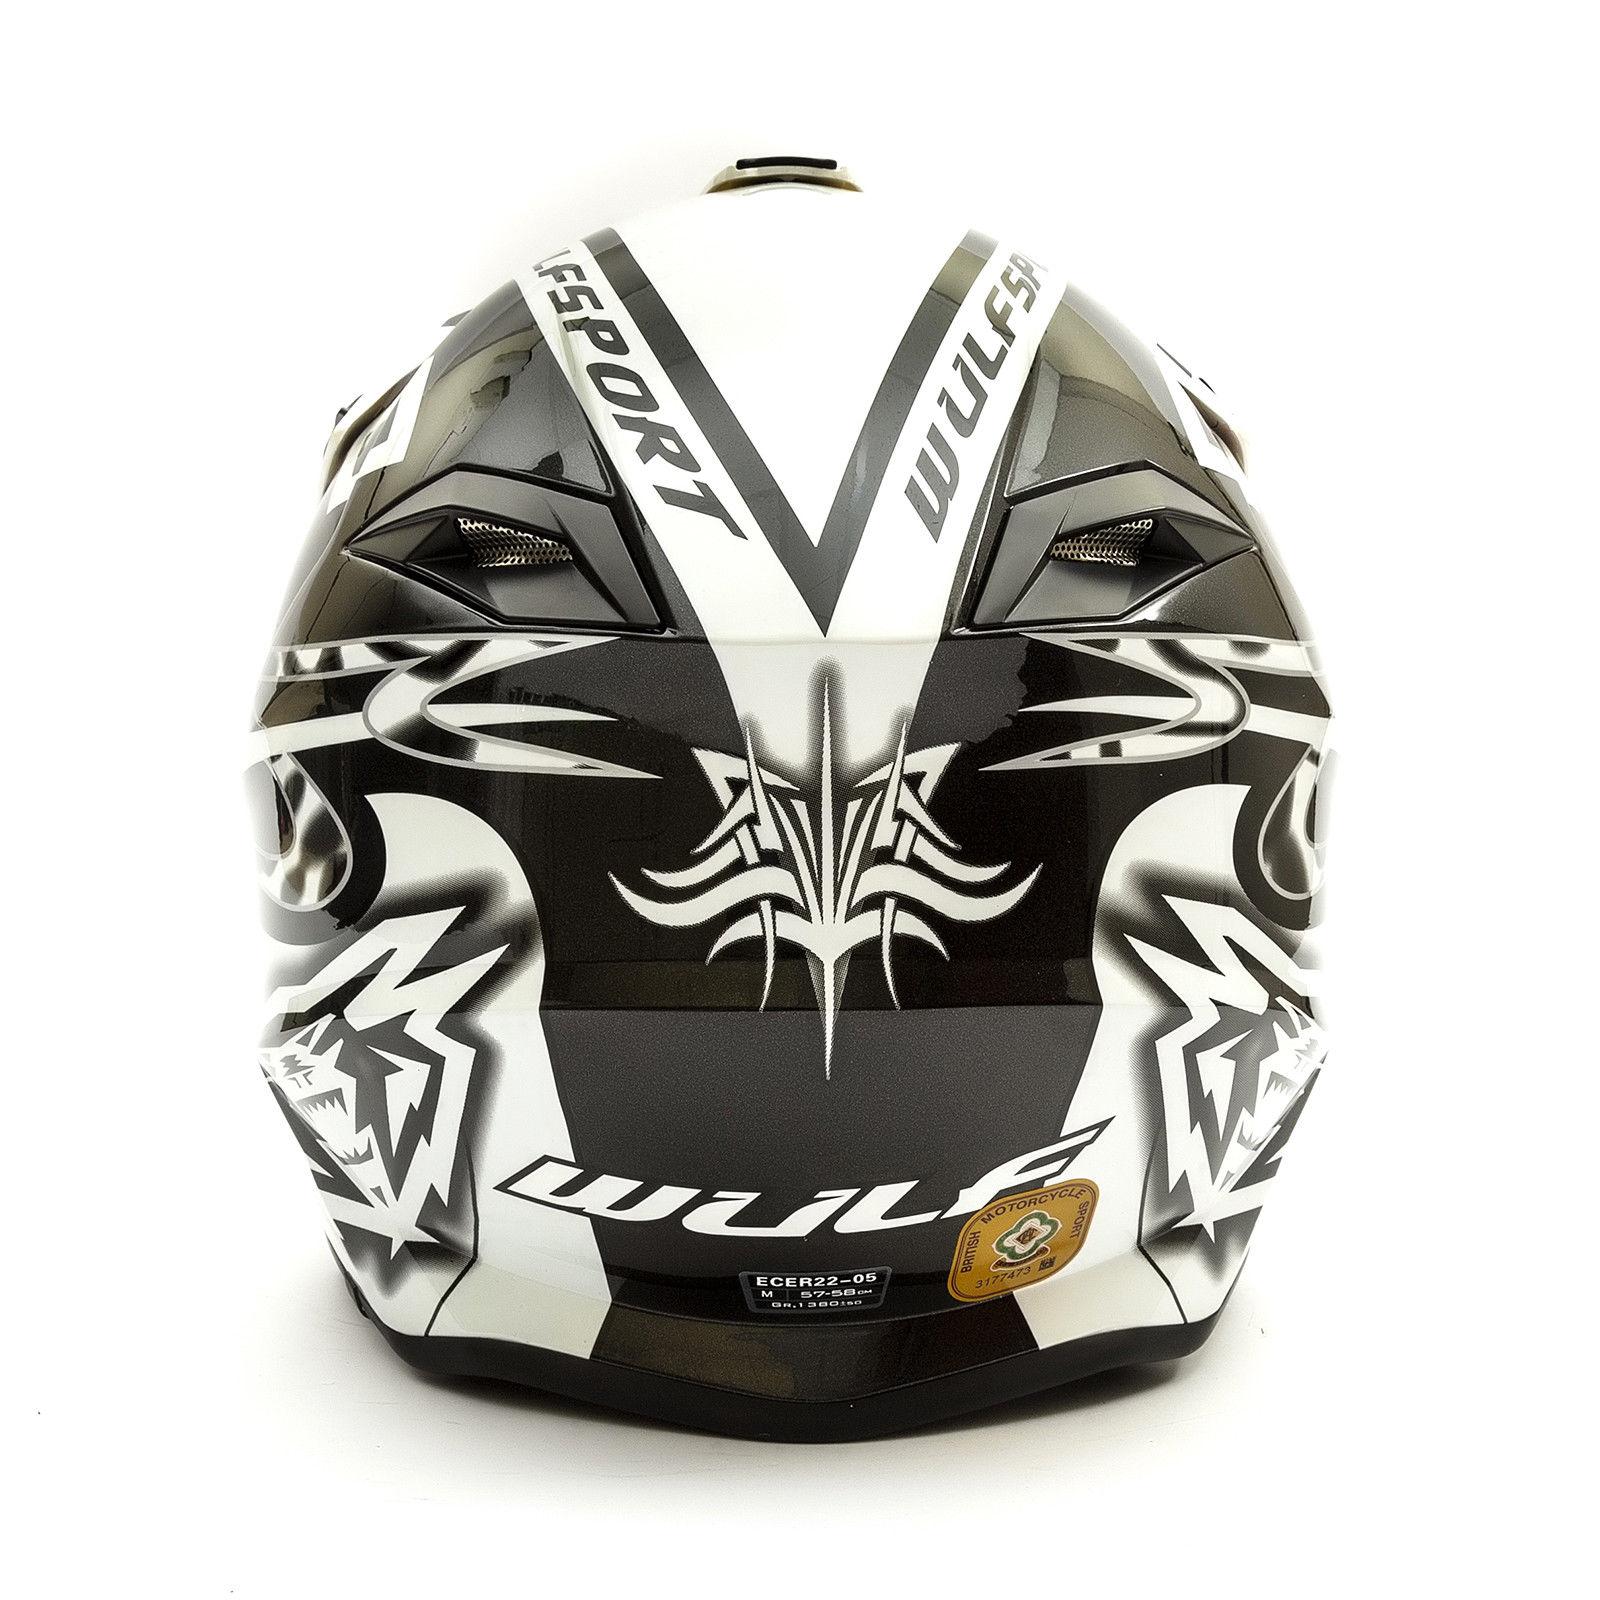 Wulfsport-Adult-Sceptre-Helmets-Motocross-Pitbike-Motorbike-Off-Road-Racing-ATV thumbnail 60